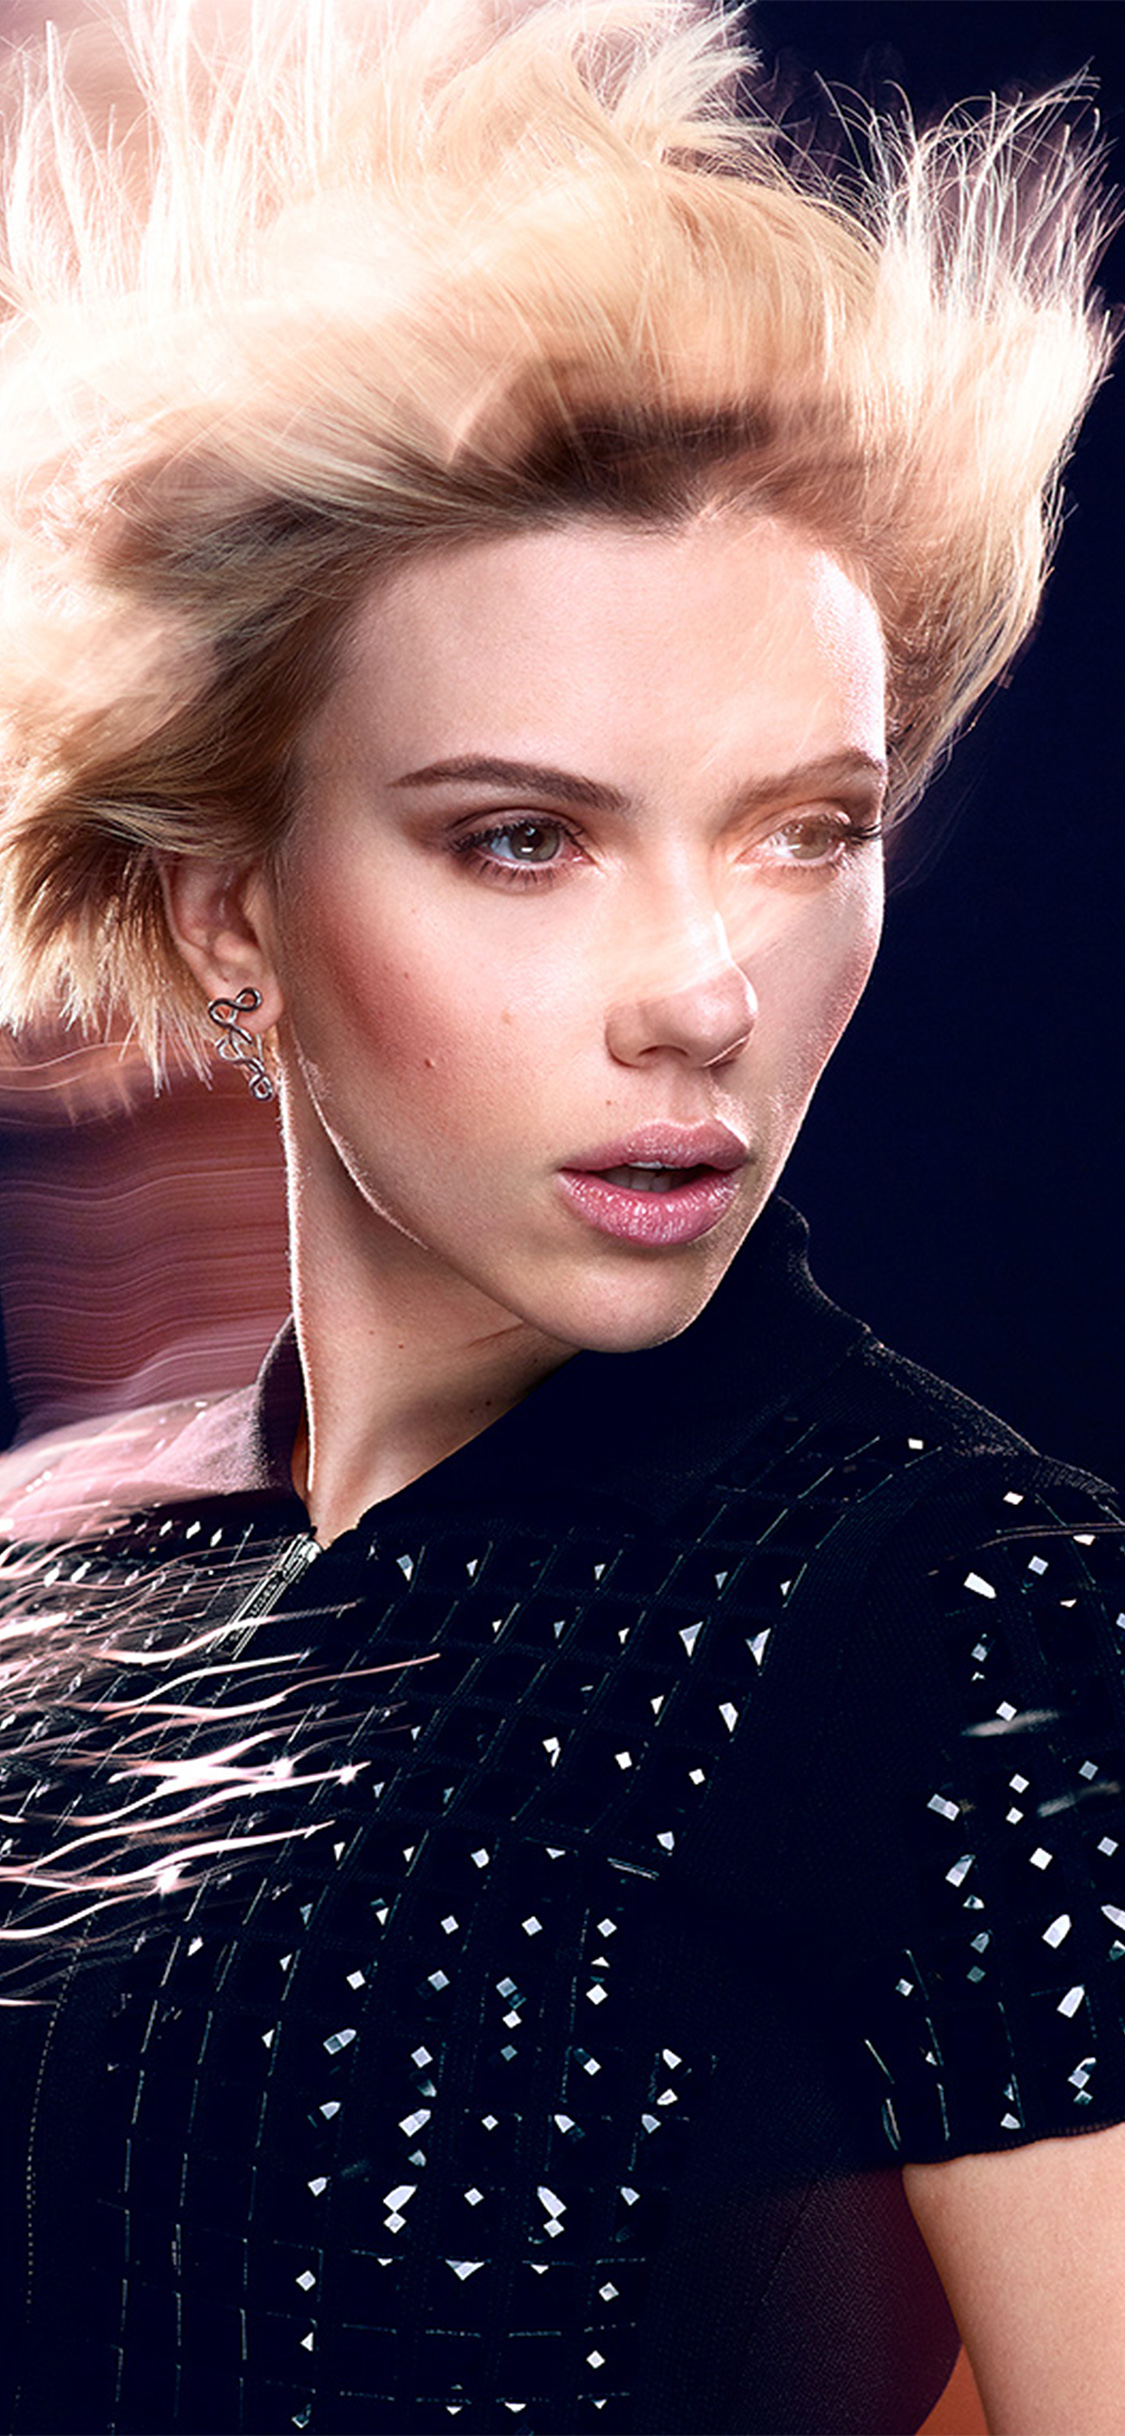 iPhoneXpapers.com-Apple-iPhone-wallpaper-hm51-scarlett-johansson-actress-celebrity-model-photoshoot